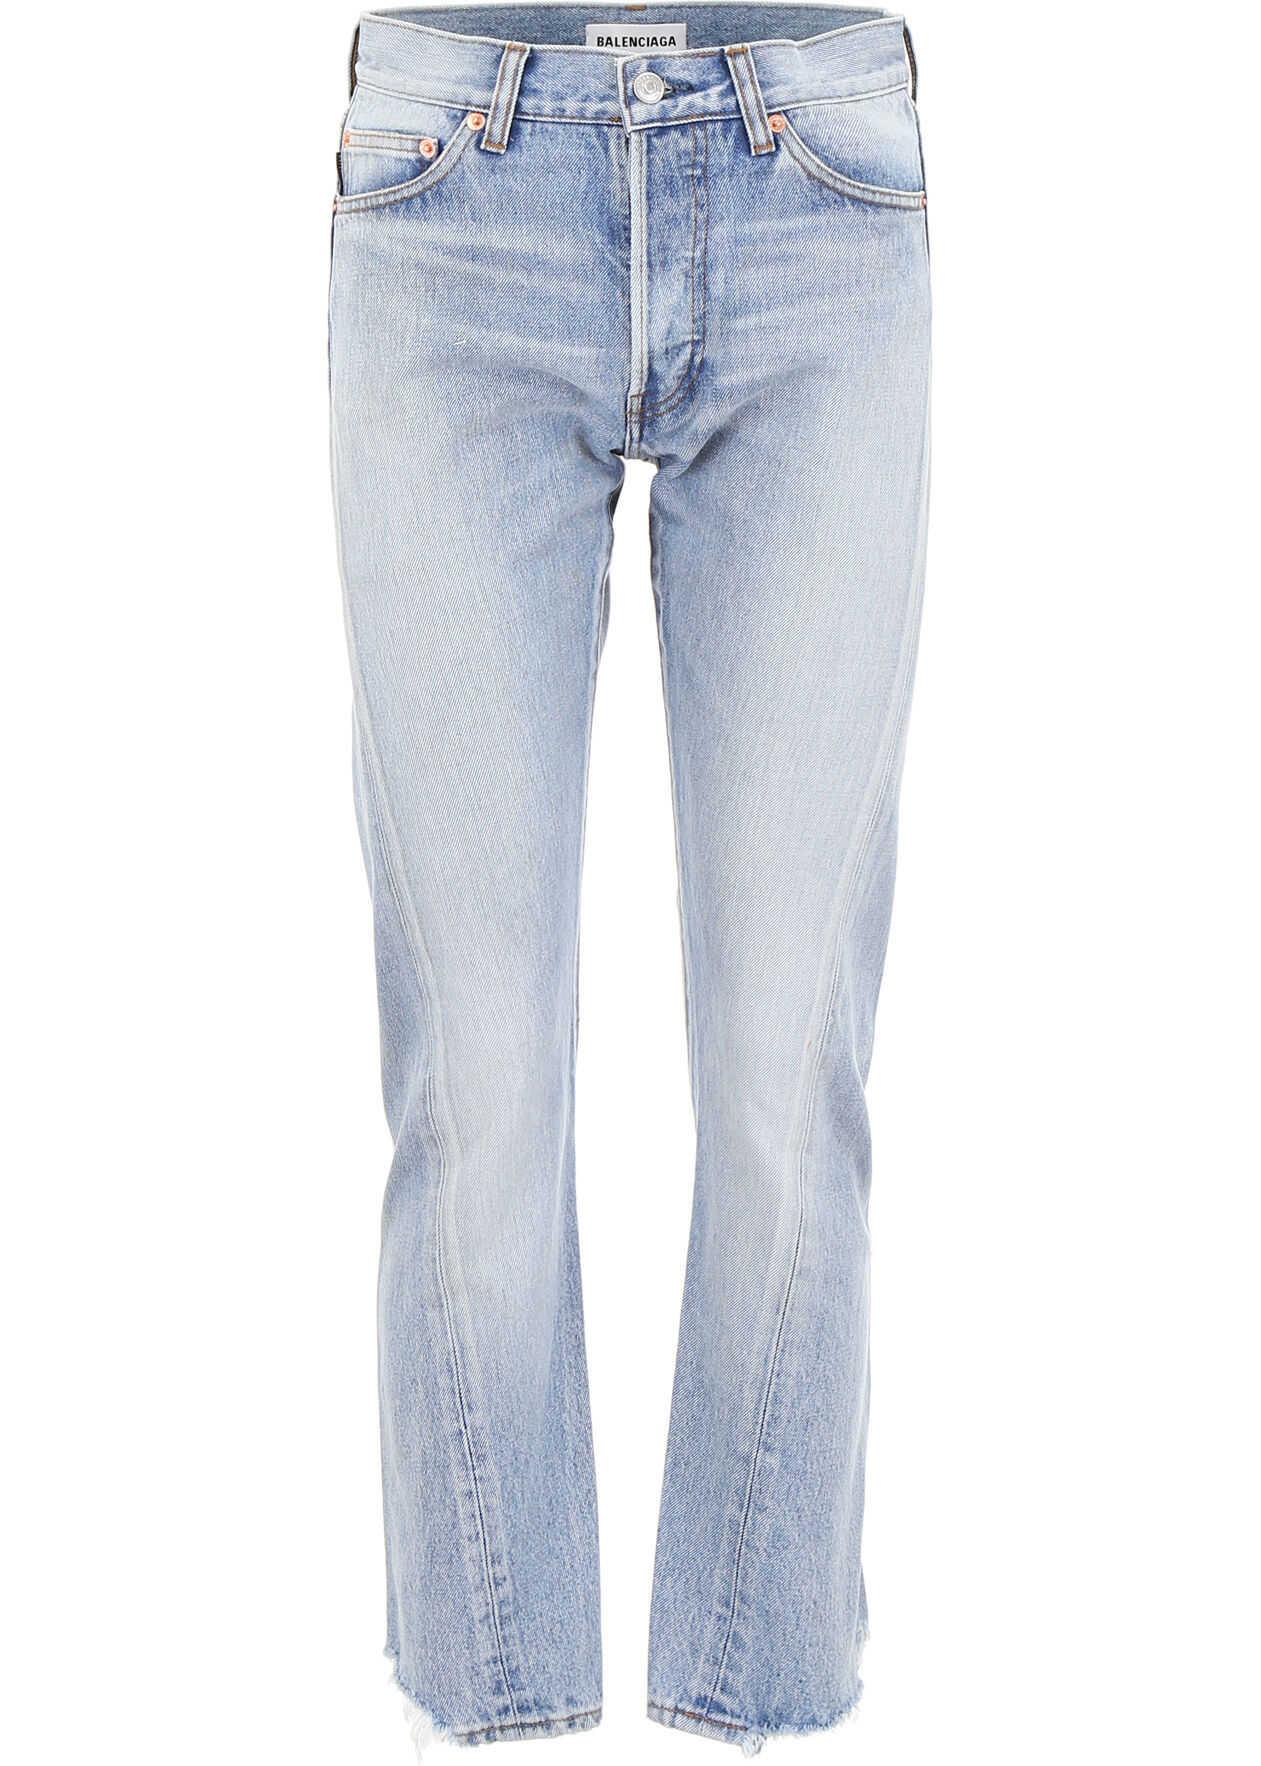 Balenciaga Denim Jeans DIRTY LIGHT BLUE